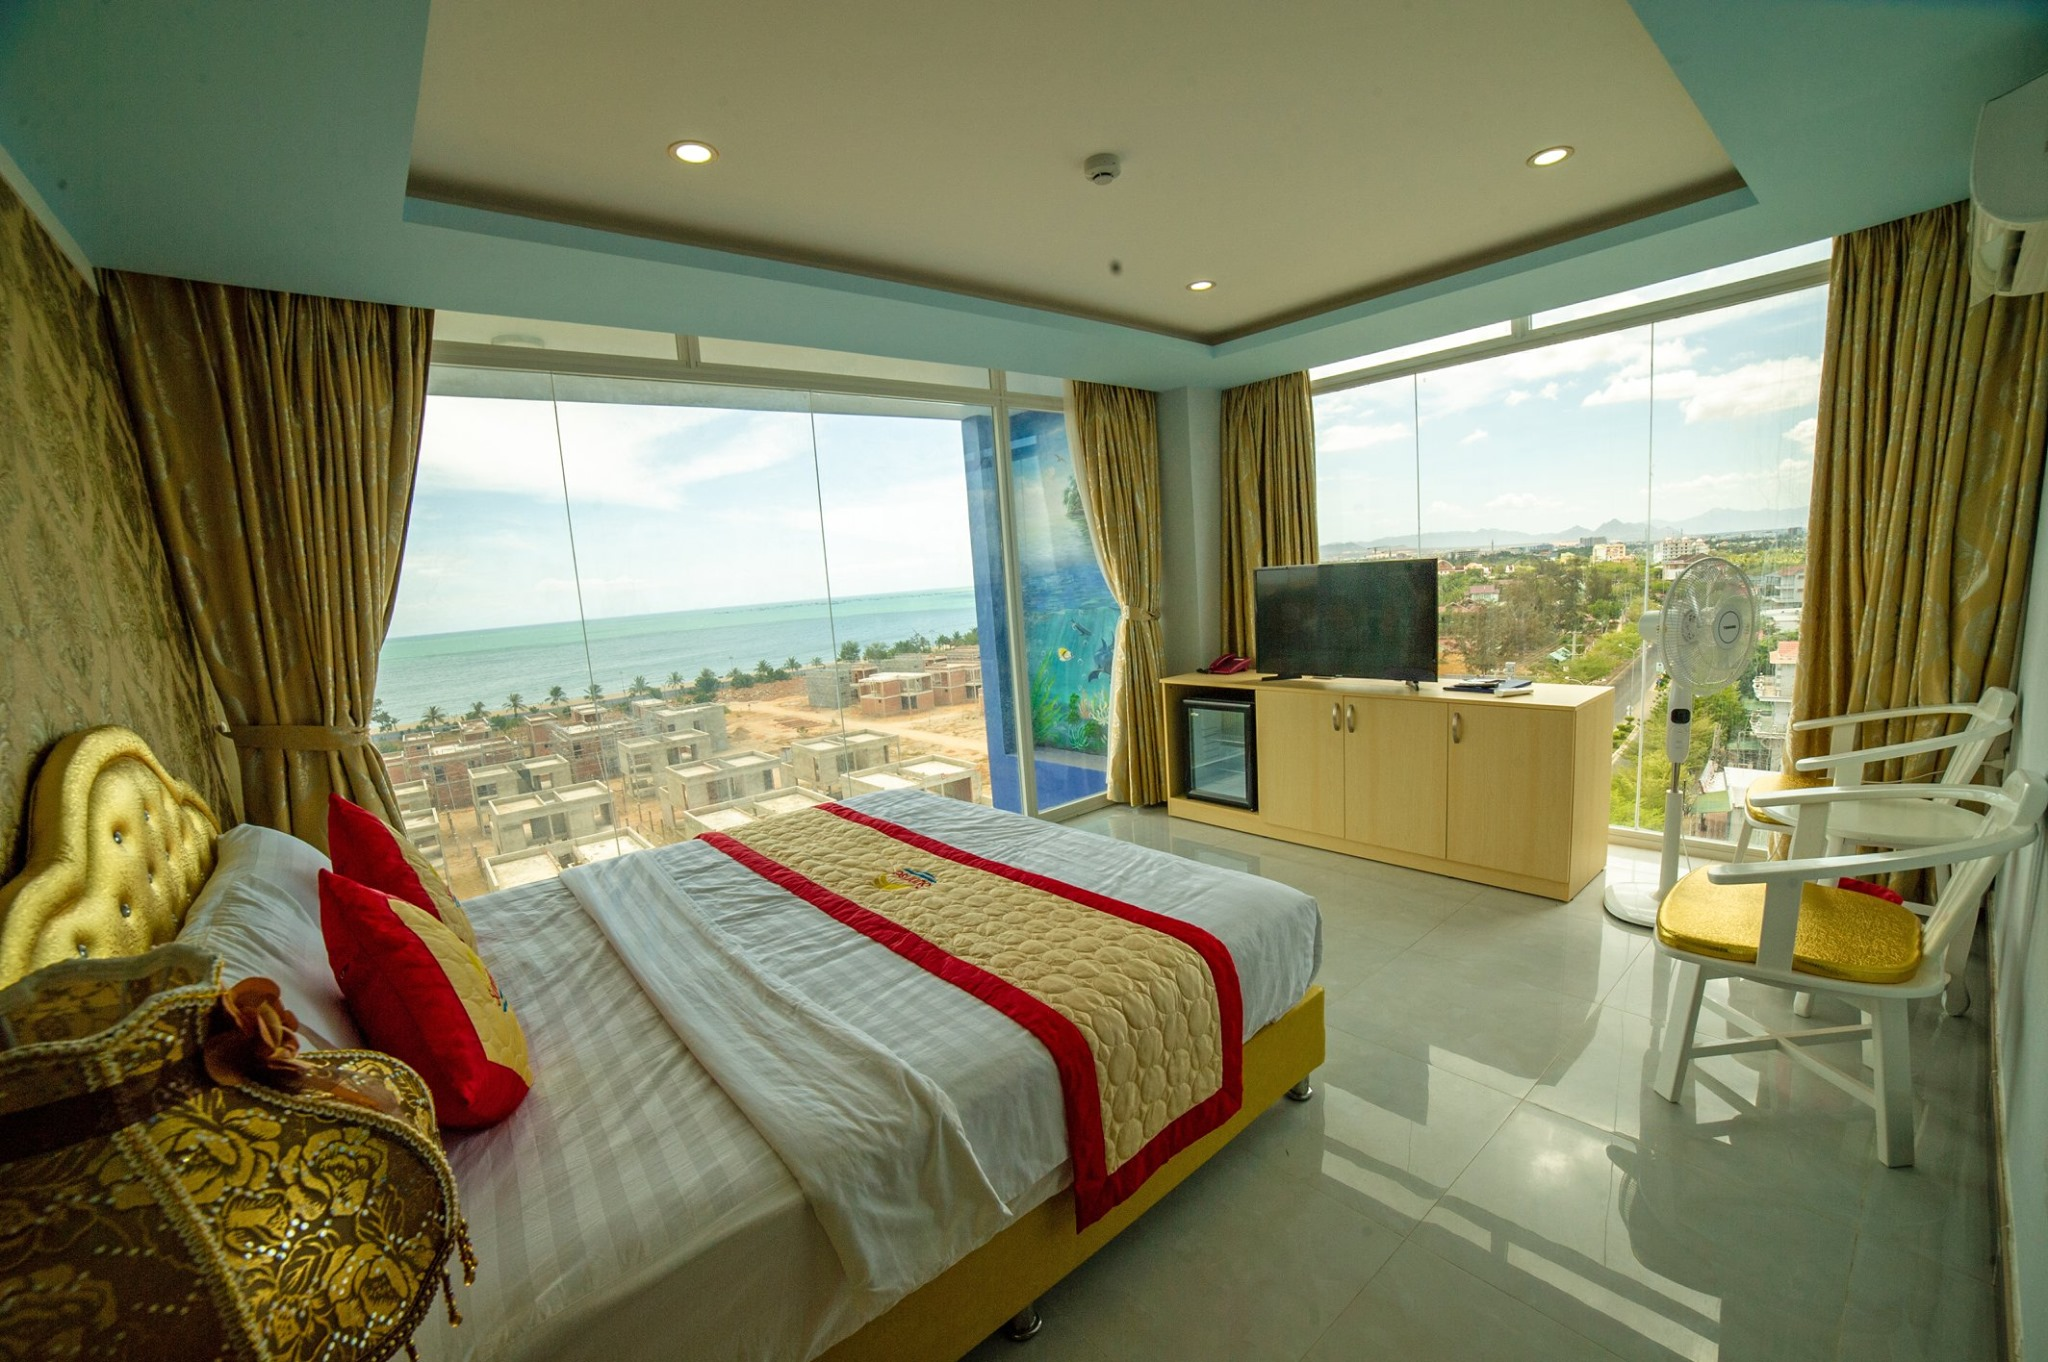 Sunrise-Ninh-Thuận-Hotel